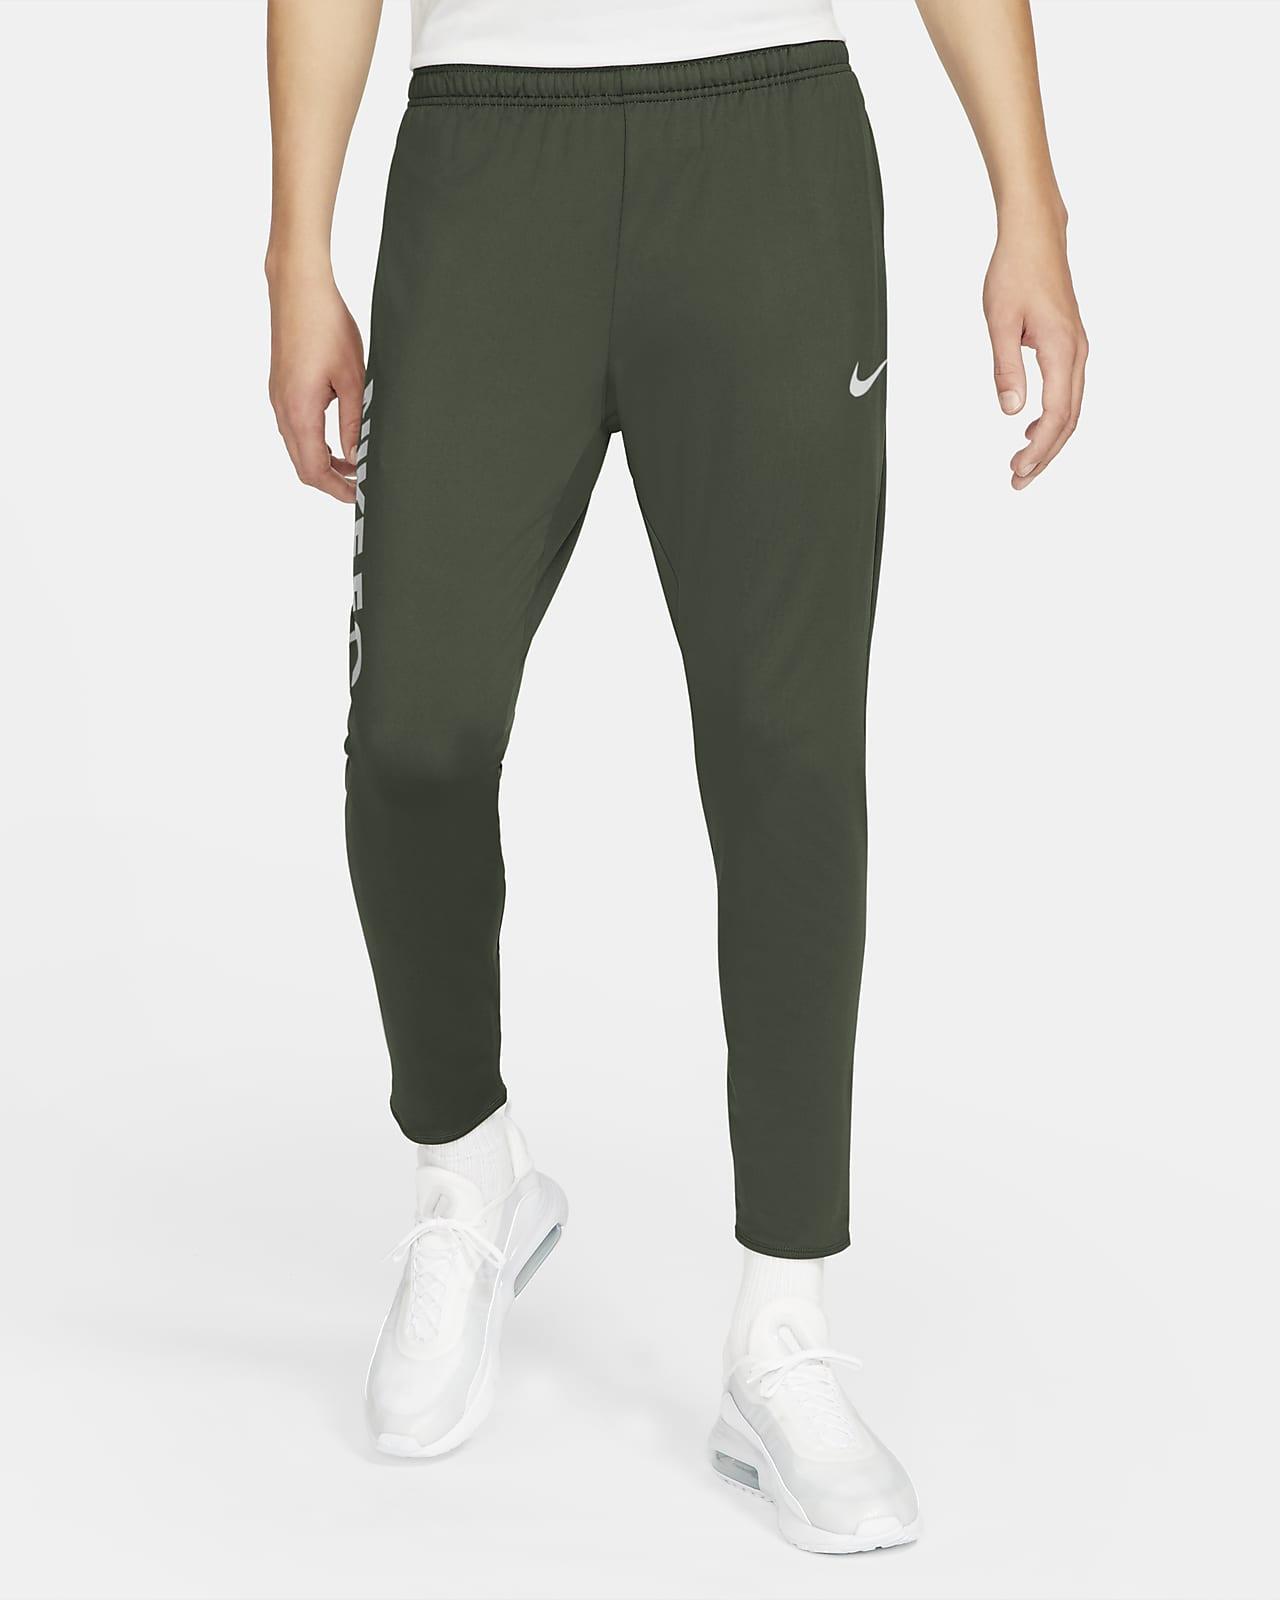 Nike F.C. Essential Men's Soccer Pants